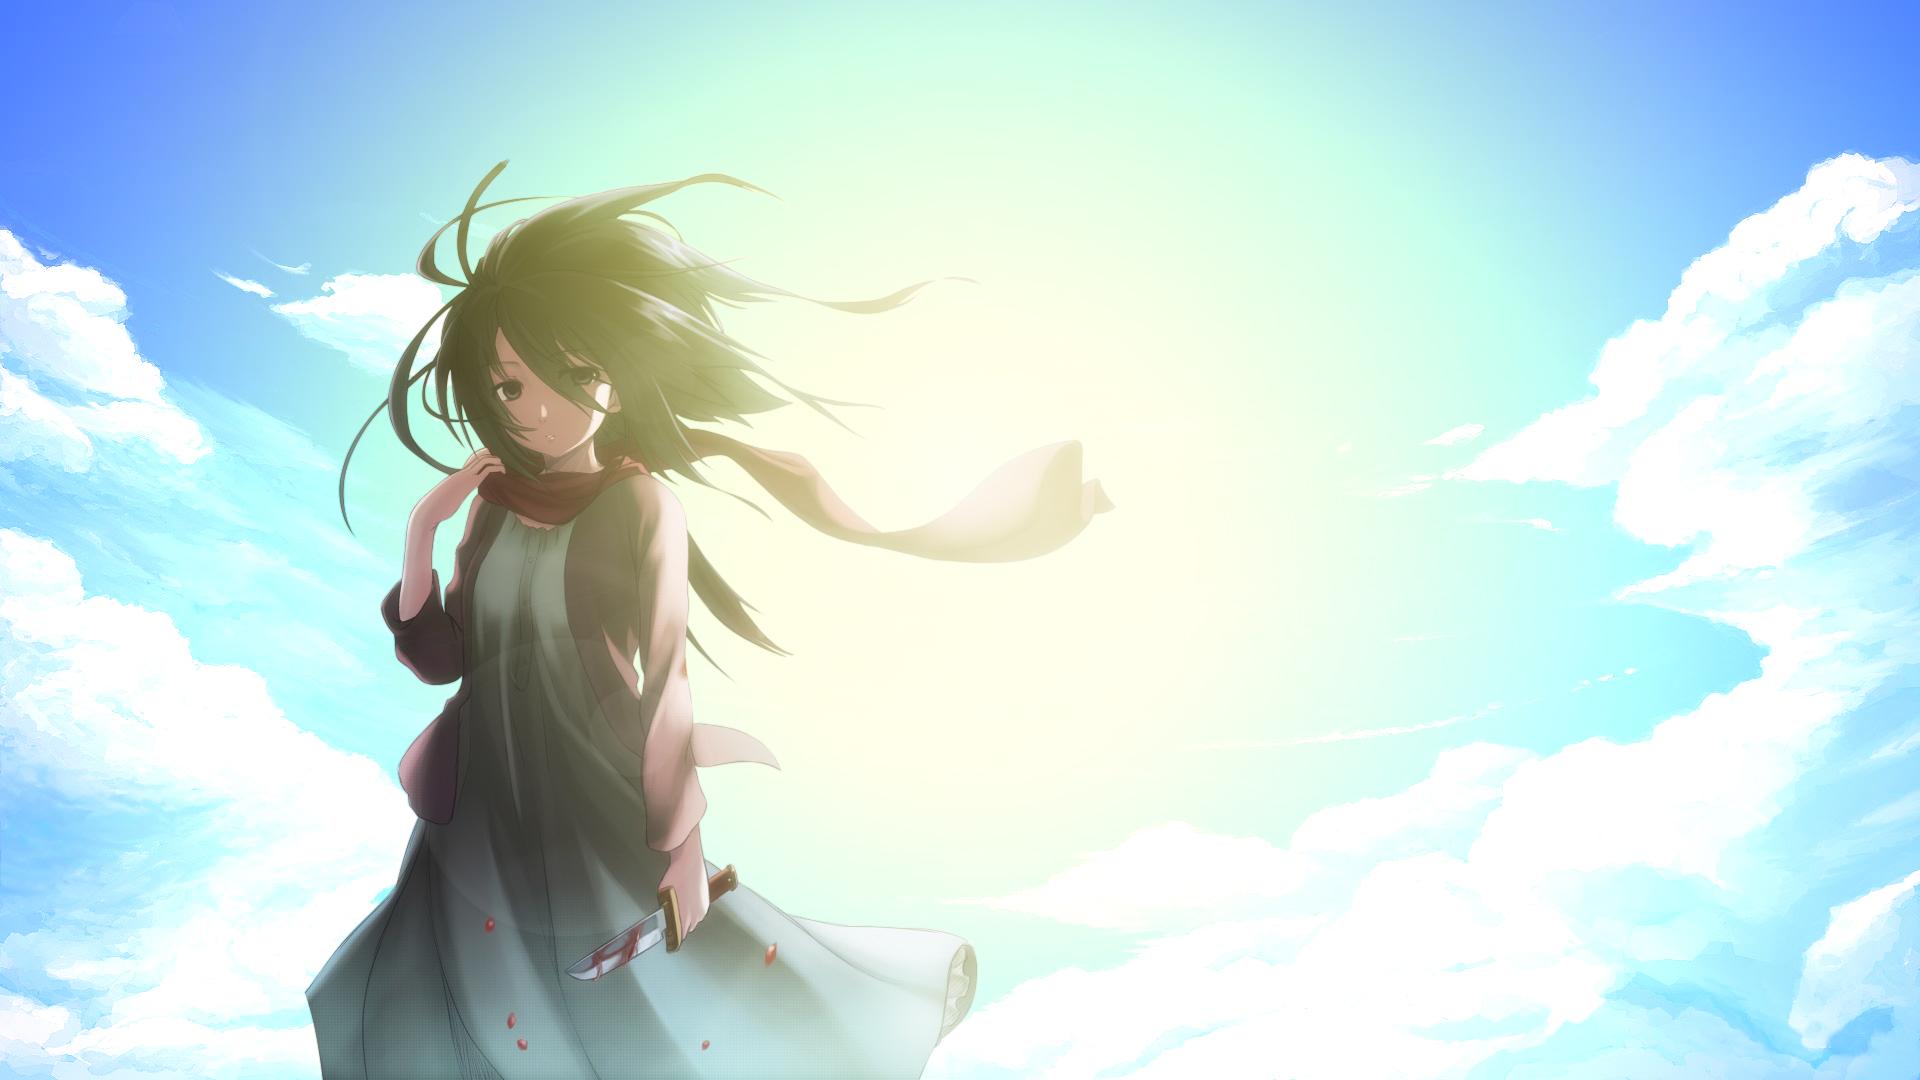 Mikasa Ackerman Wallpaper By Girkua On Deviantart